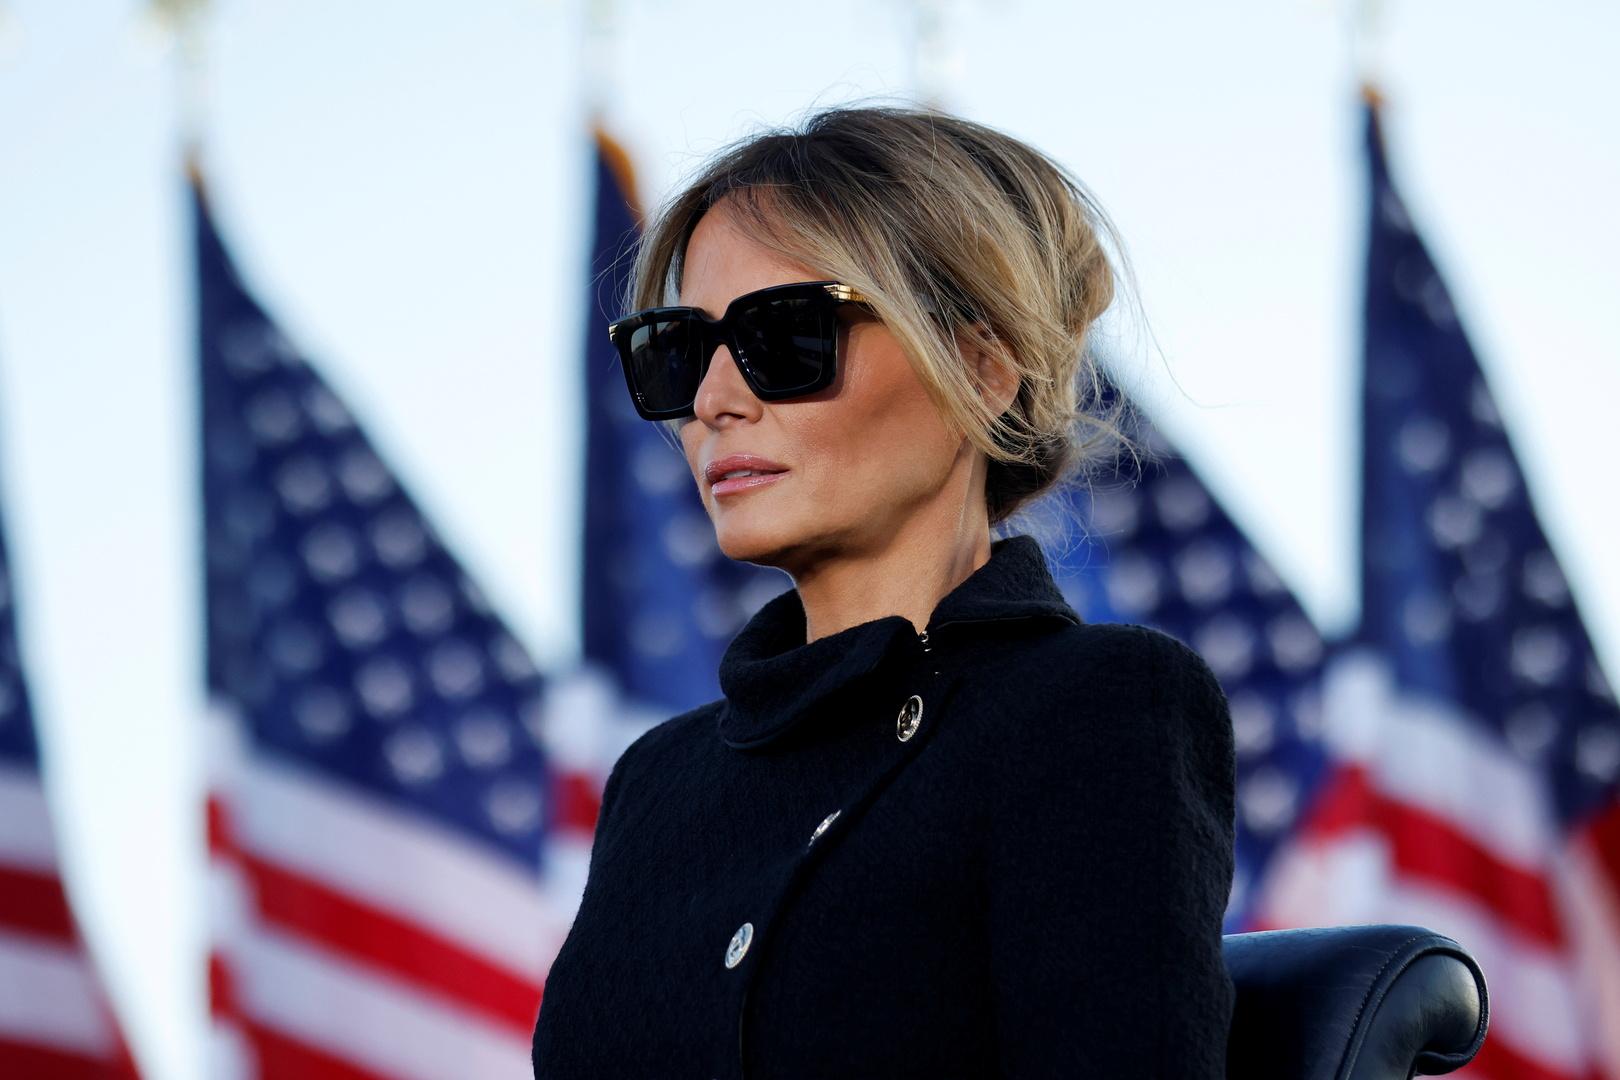 CNN: ميلانيا ترامب لم تكتب بنفسها رسائل الشكر لخادميها في البيت الابيض